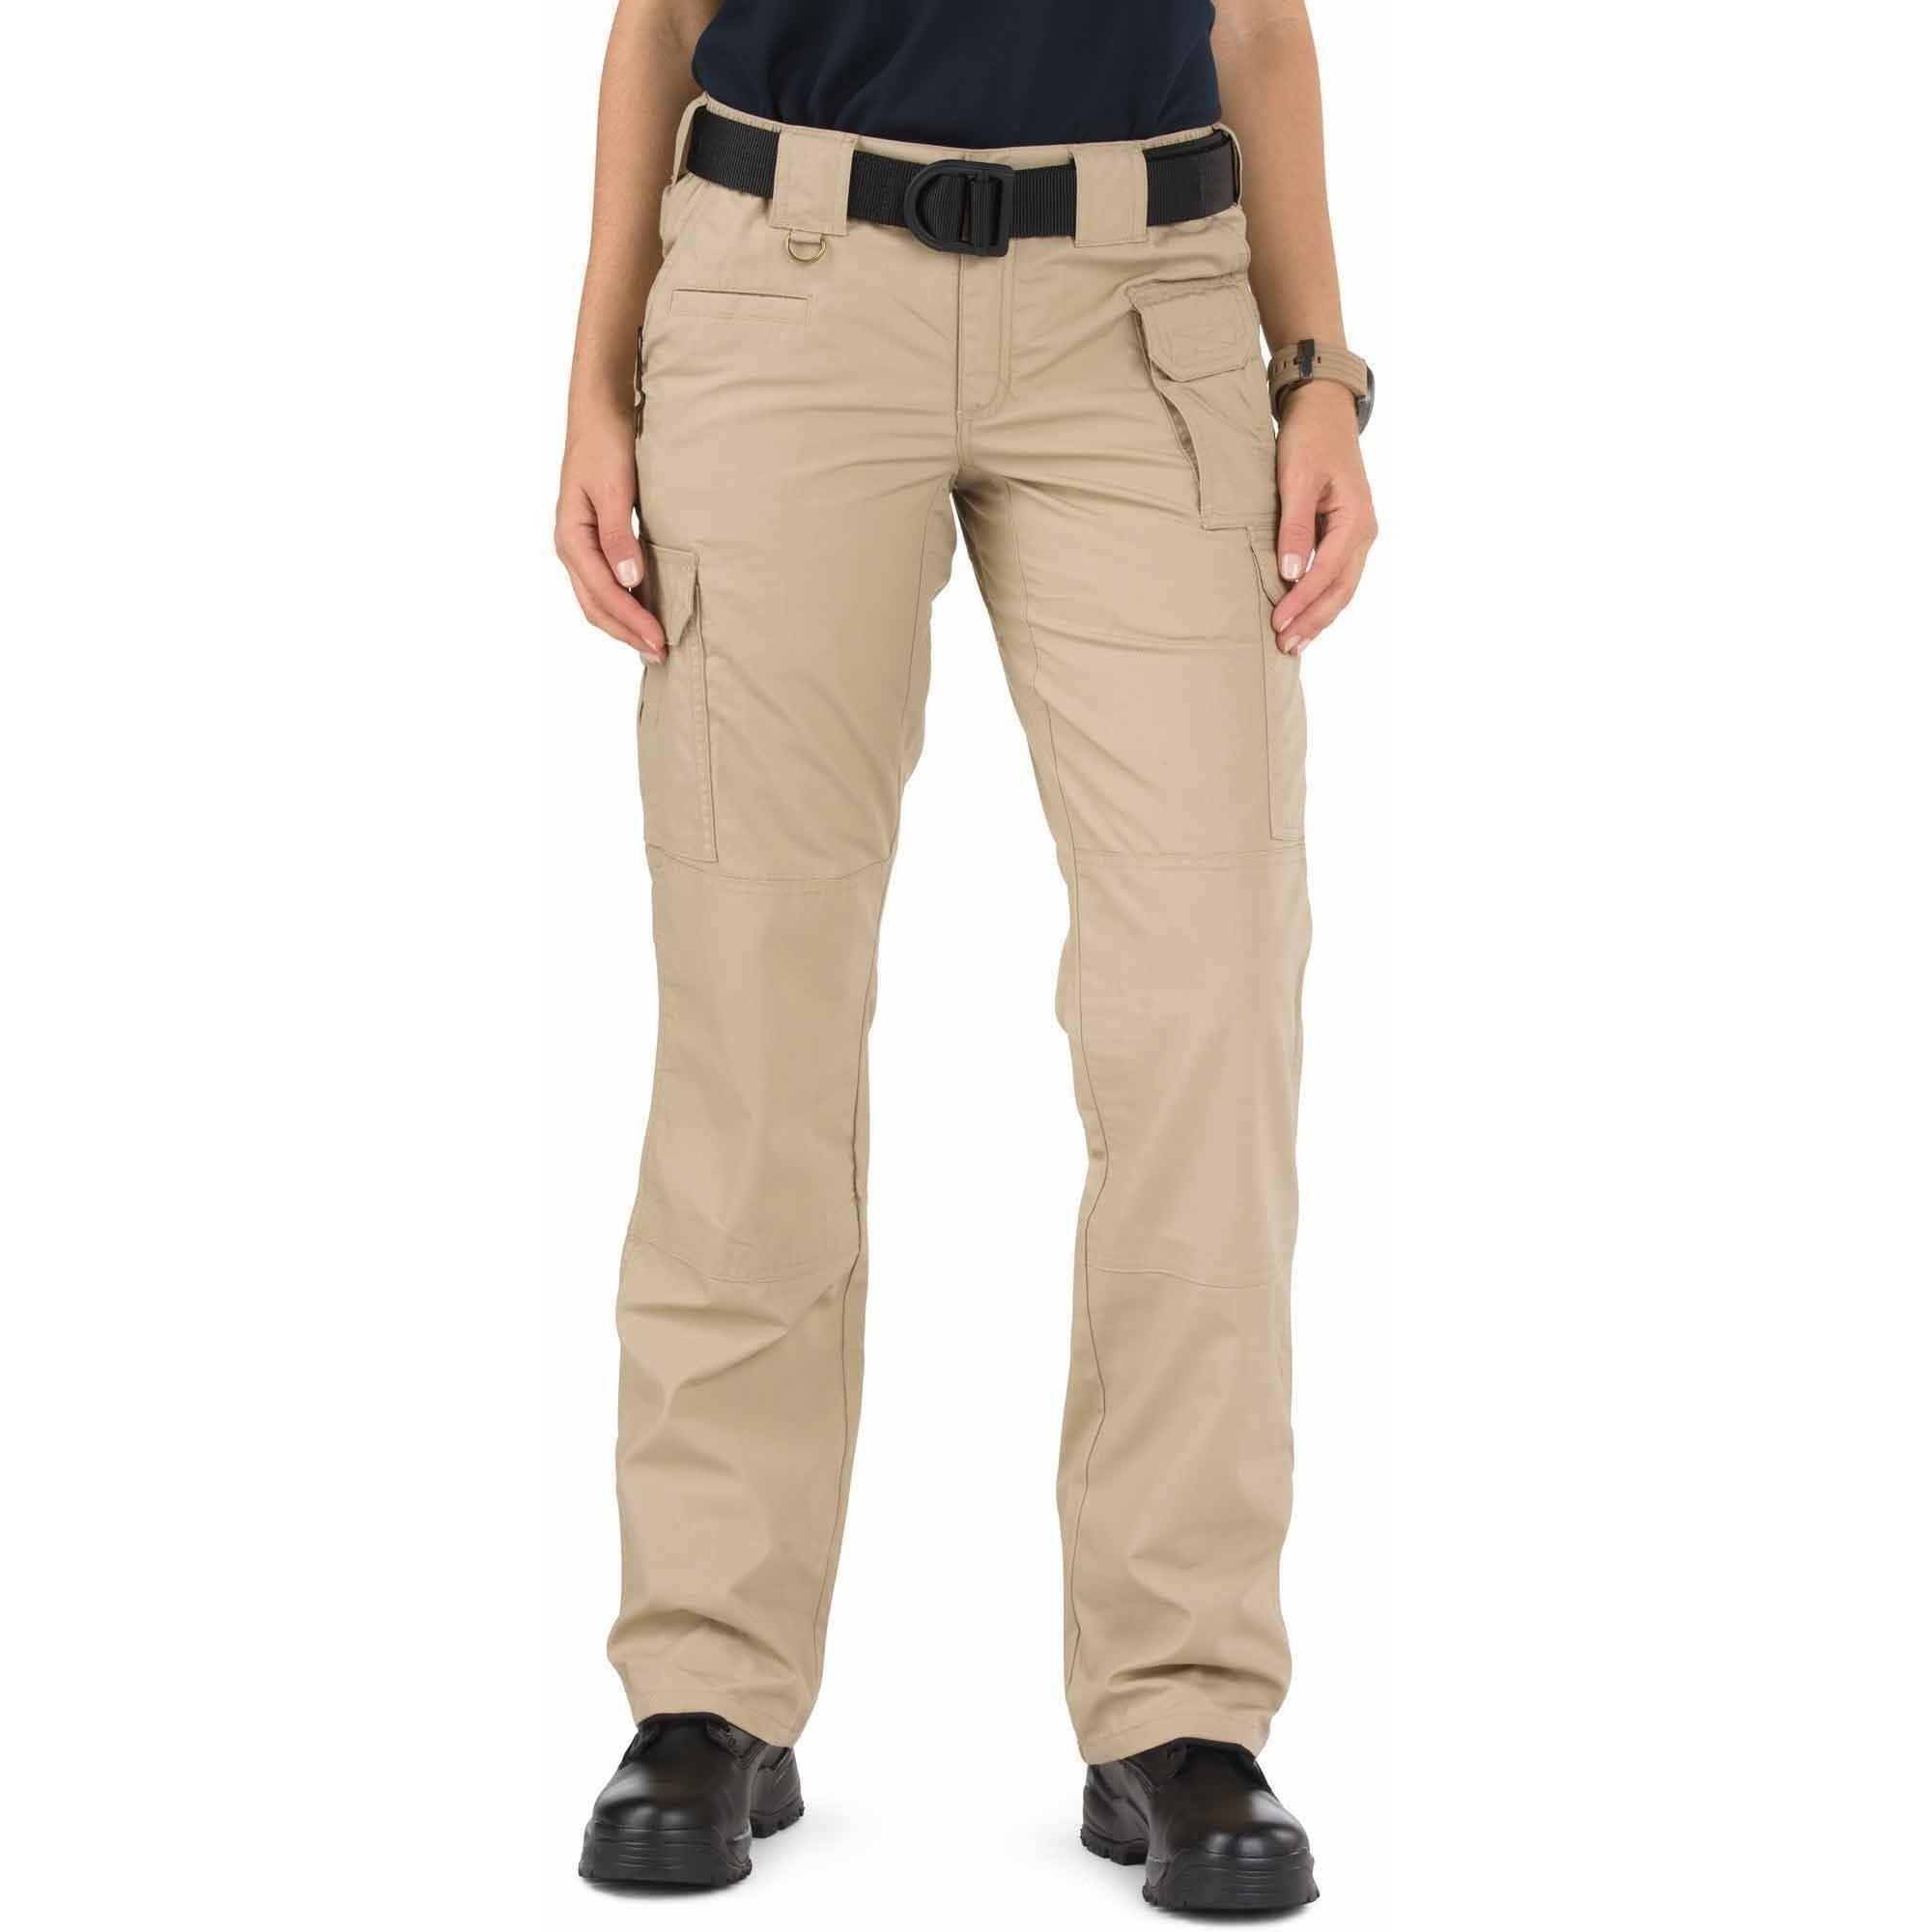 5.11 Tactical Women's Taclite Professional Pant, TDU Khaki